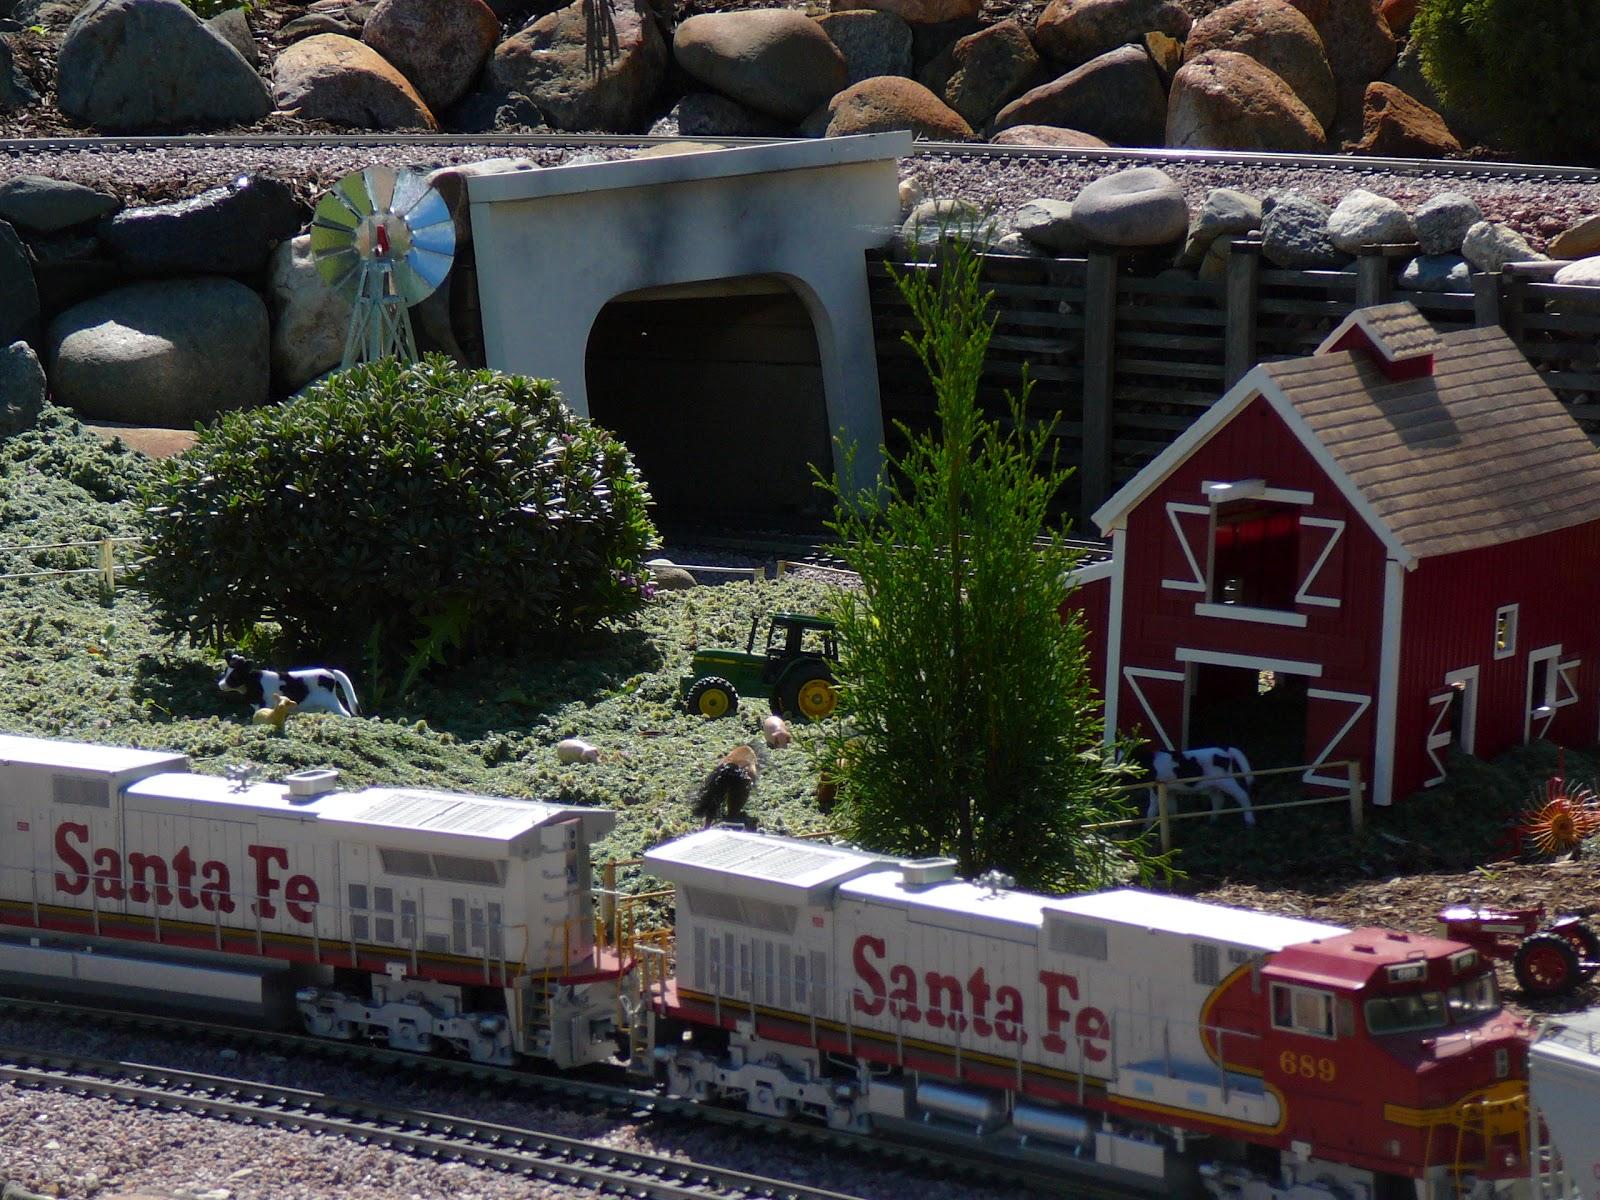 maine garden railway society member blog paul u0026 rebecca schnell